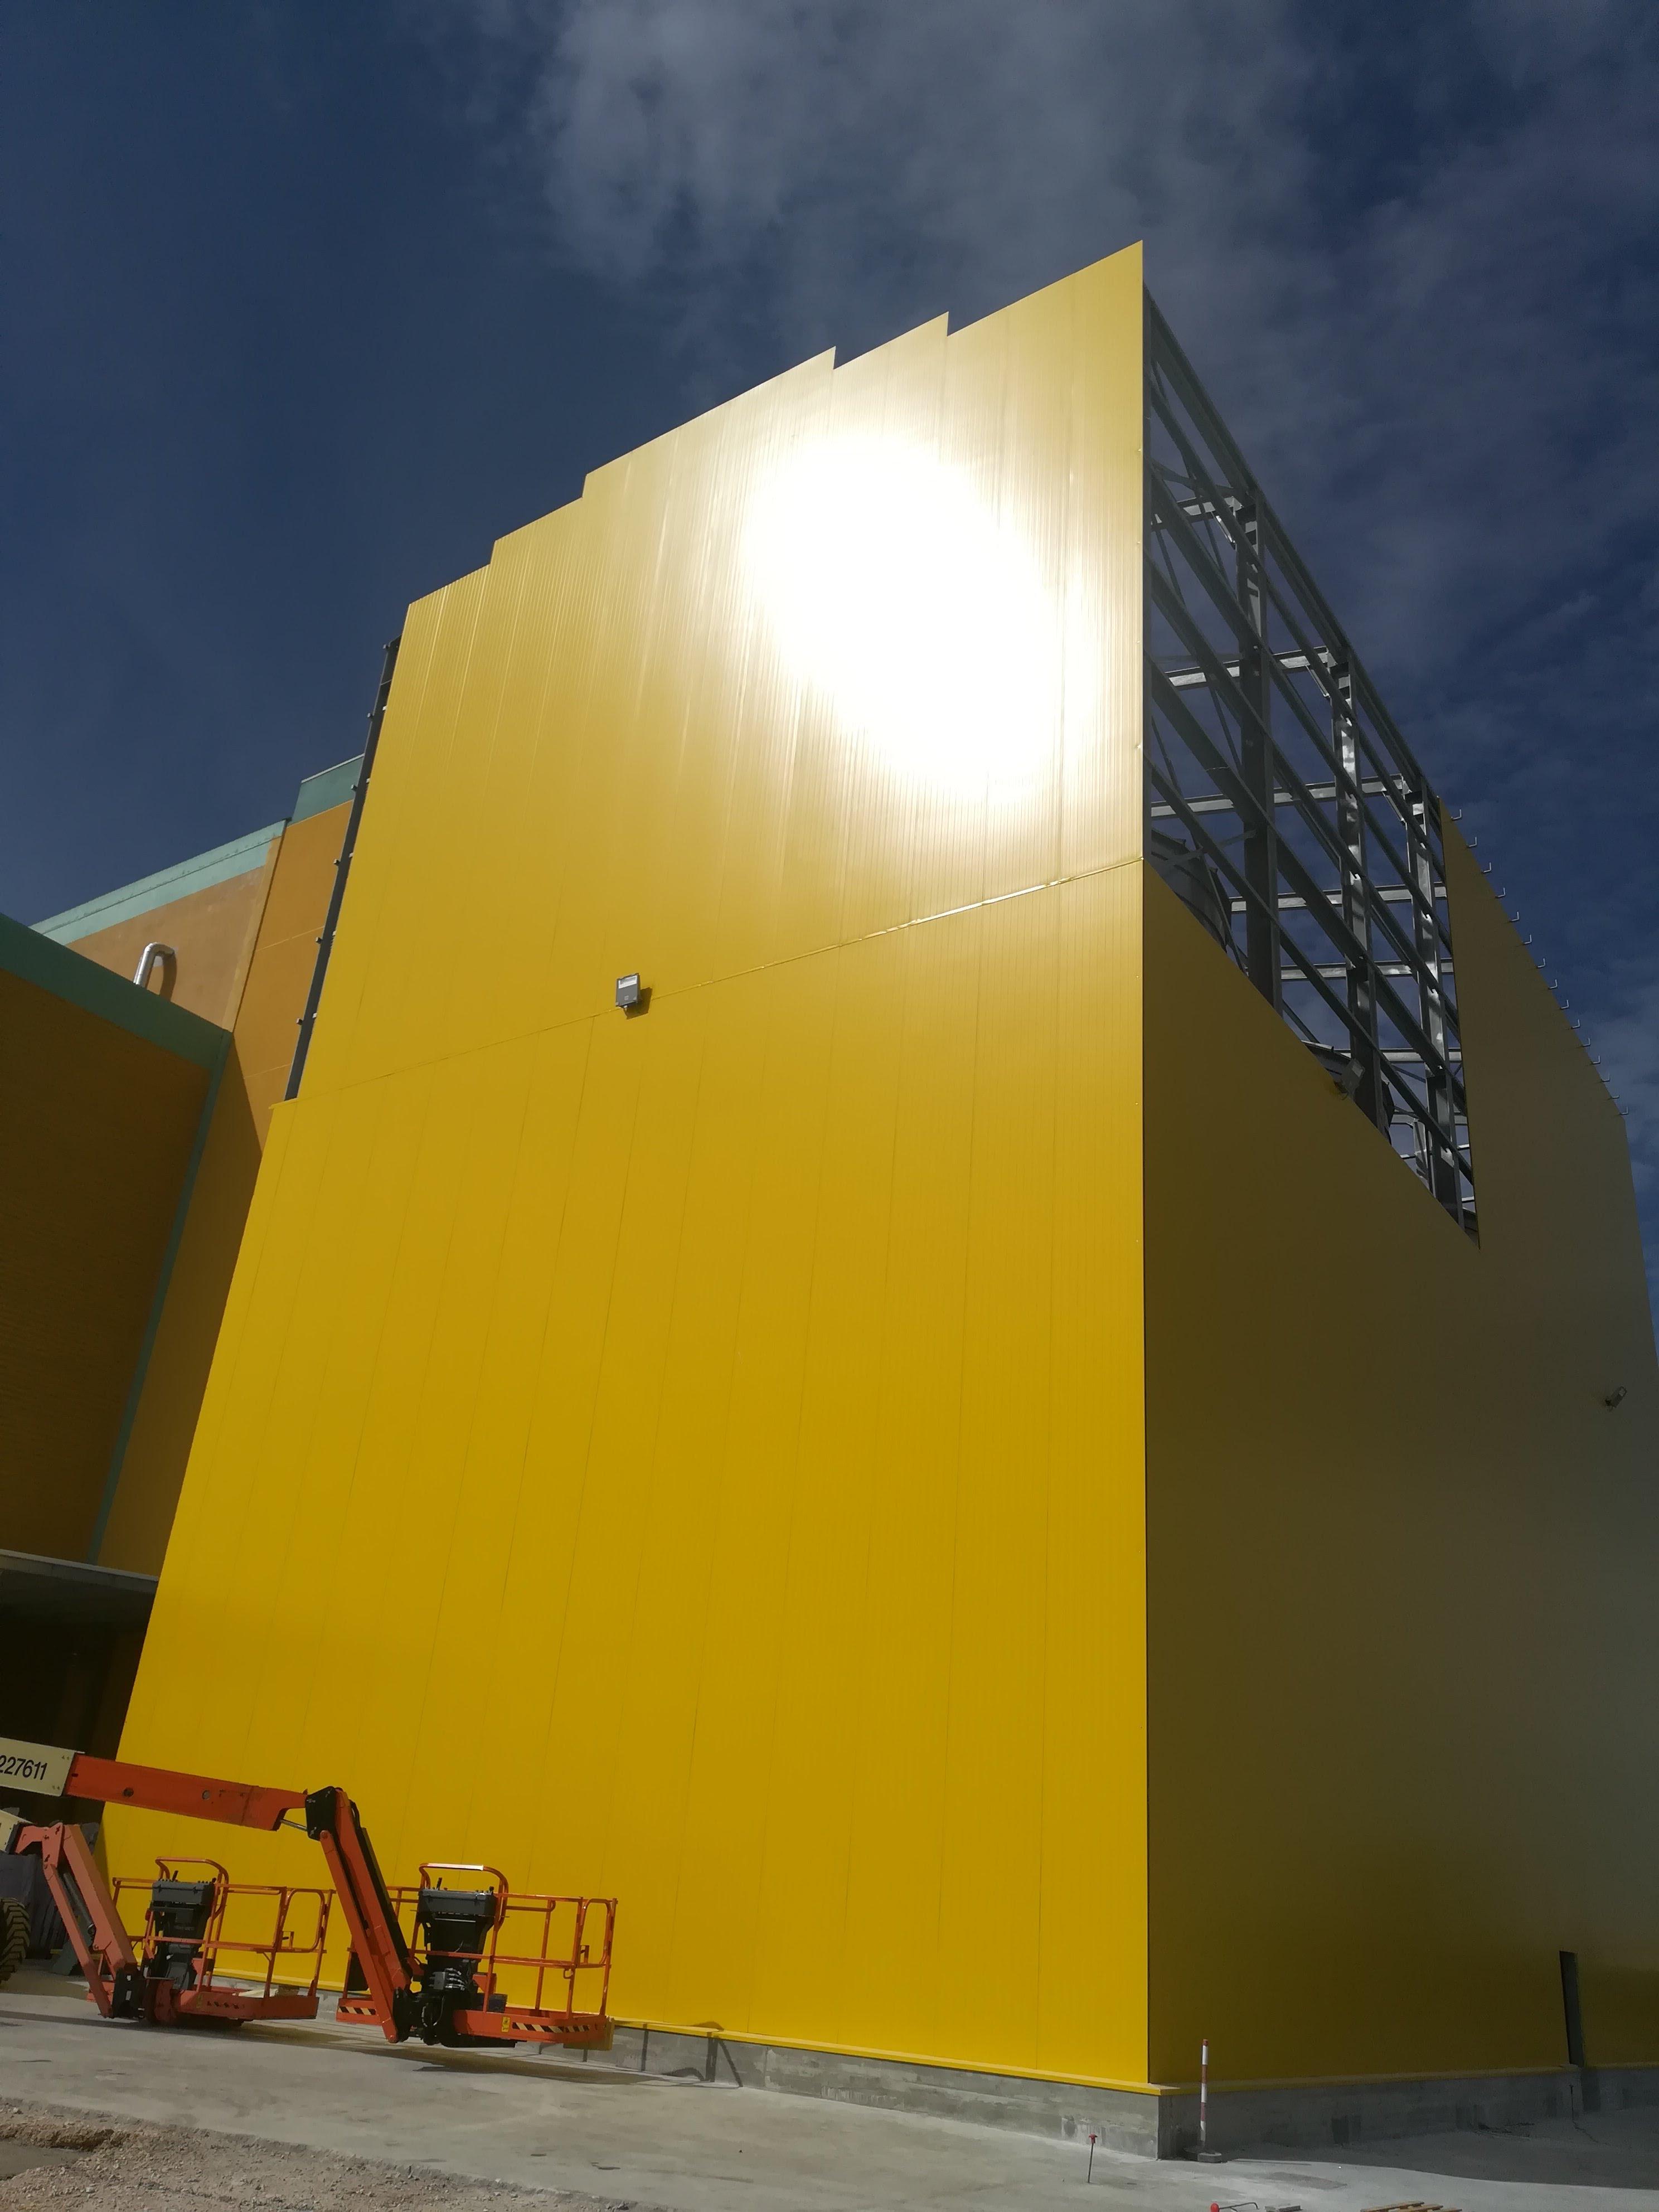 Pannellatura silos vista 1